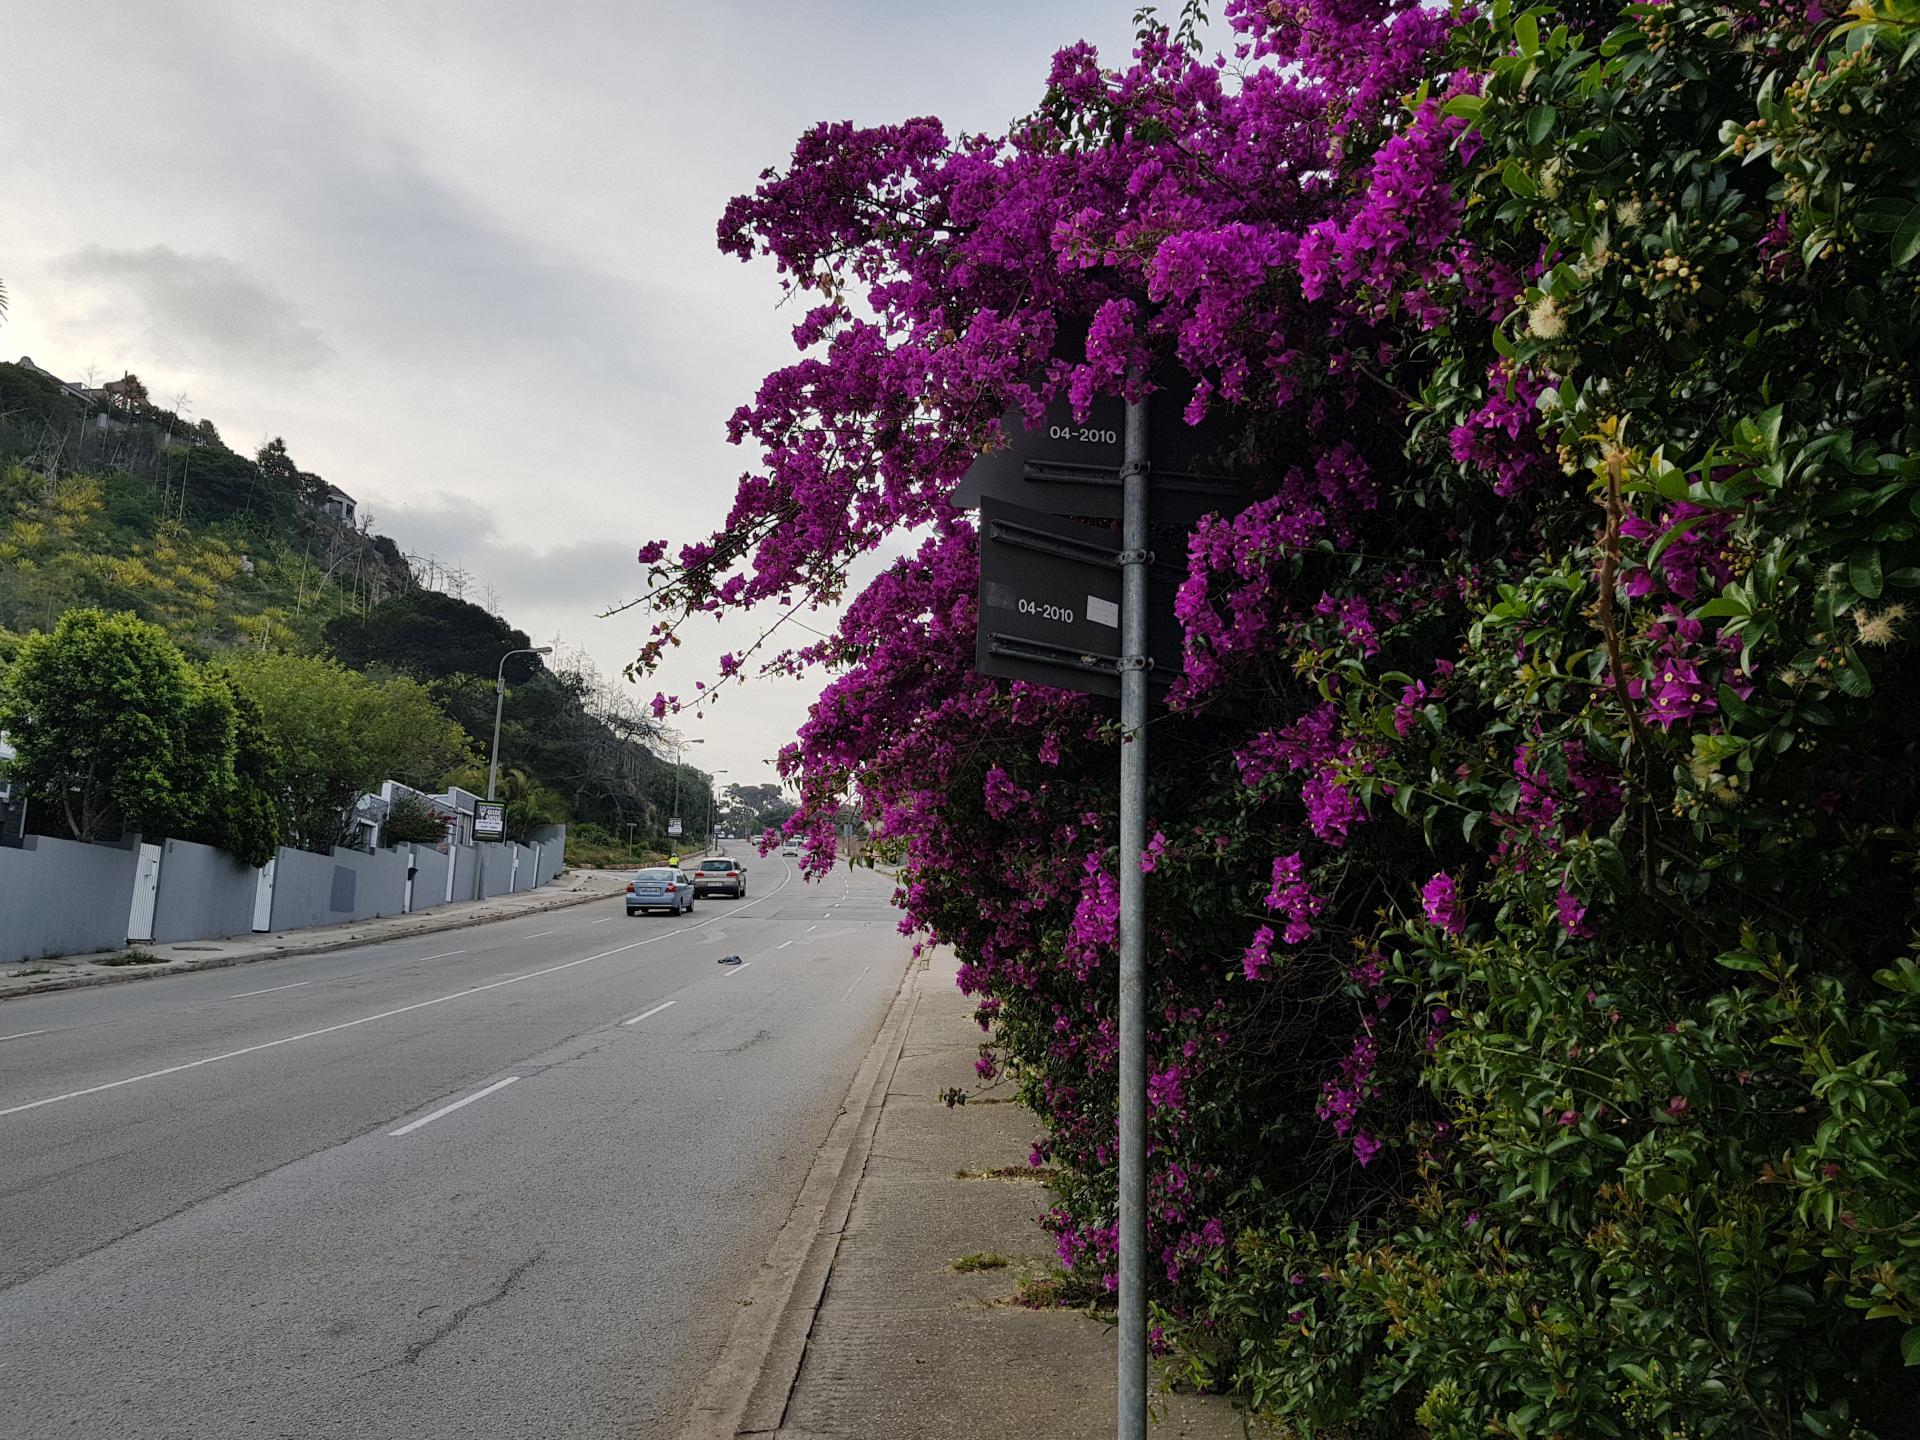 дерево с розовыми цветами в ЮАР